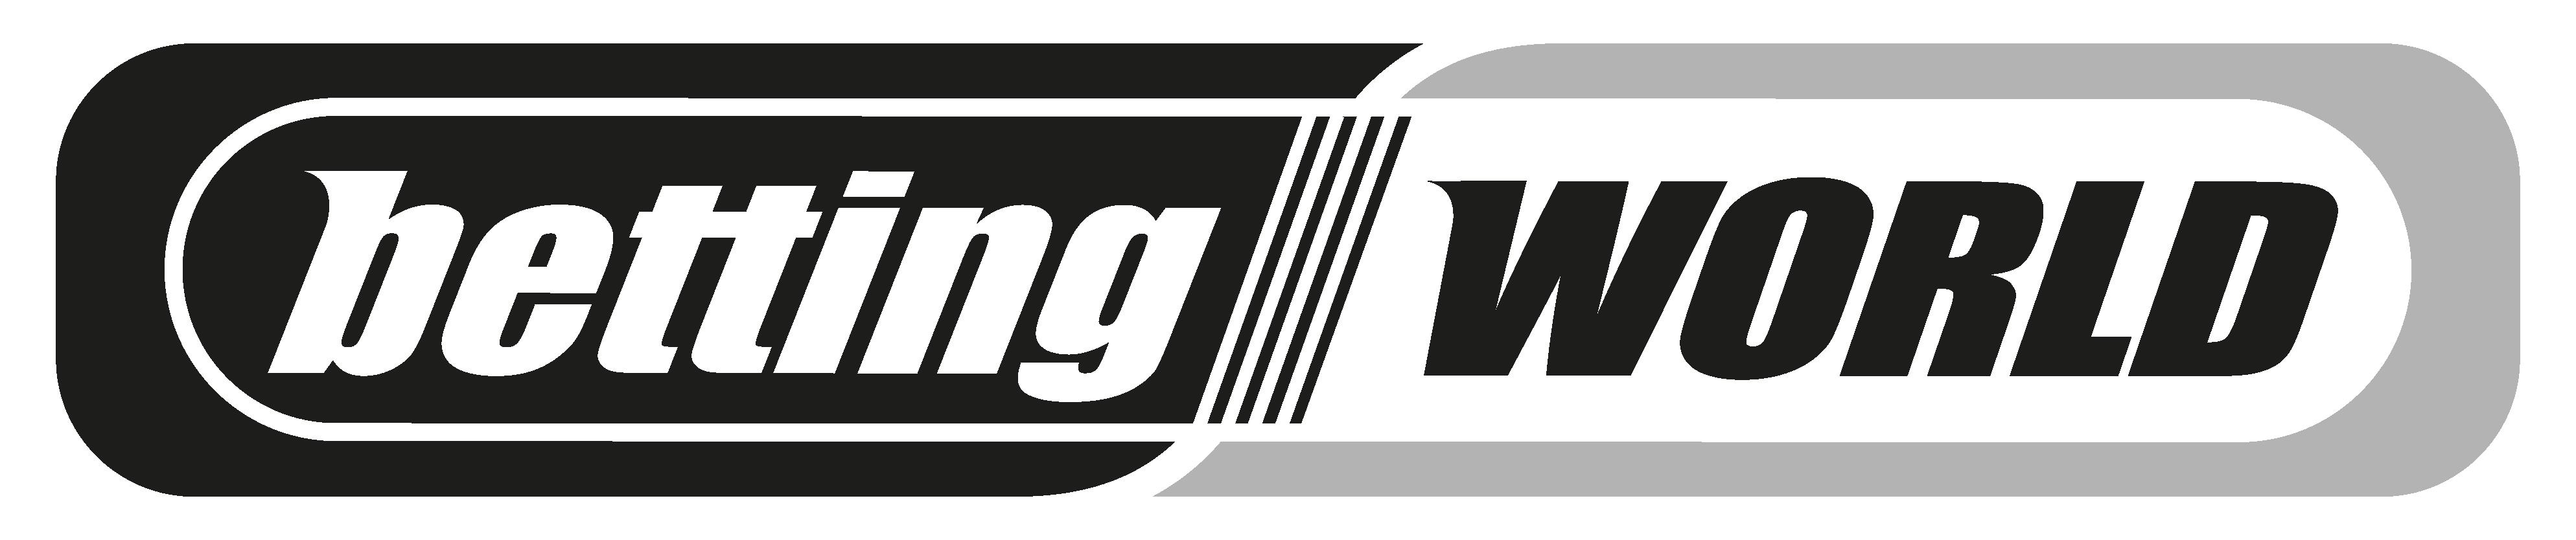 Penquin Logos_Betting World-bw.png